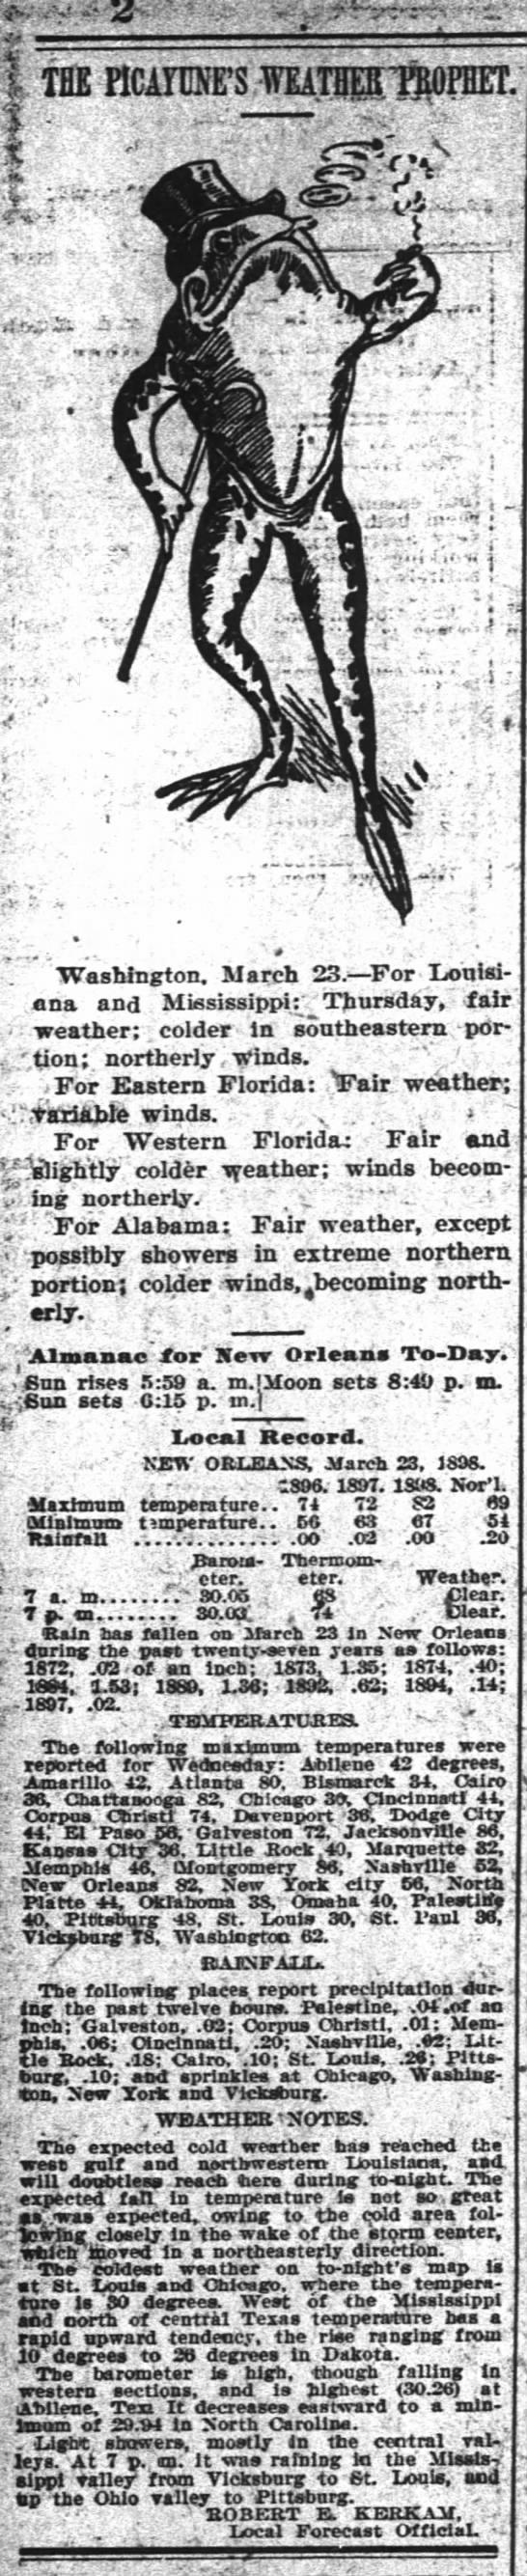 1898 The Time-Picayune : Weather Prophet - . . - ; .vim .;. ' - . Washington. March 23-Por...